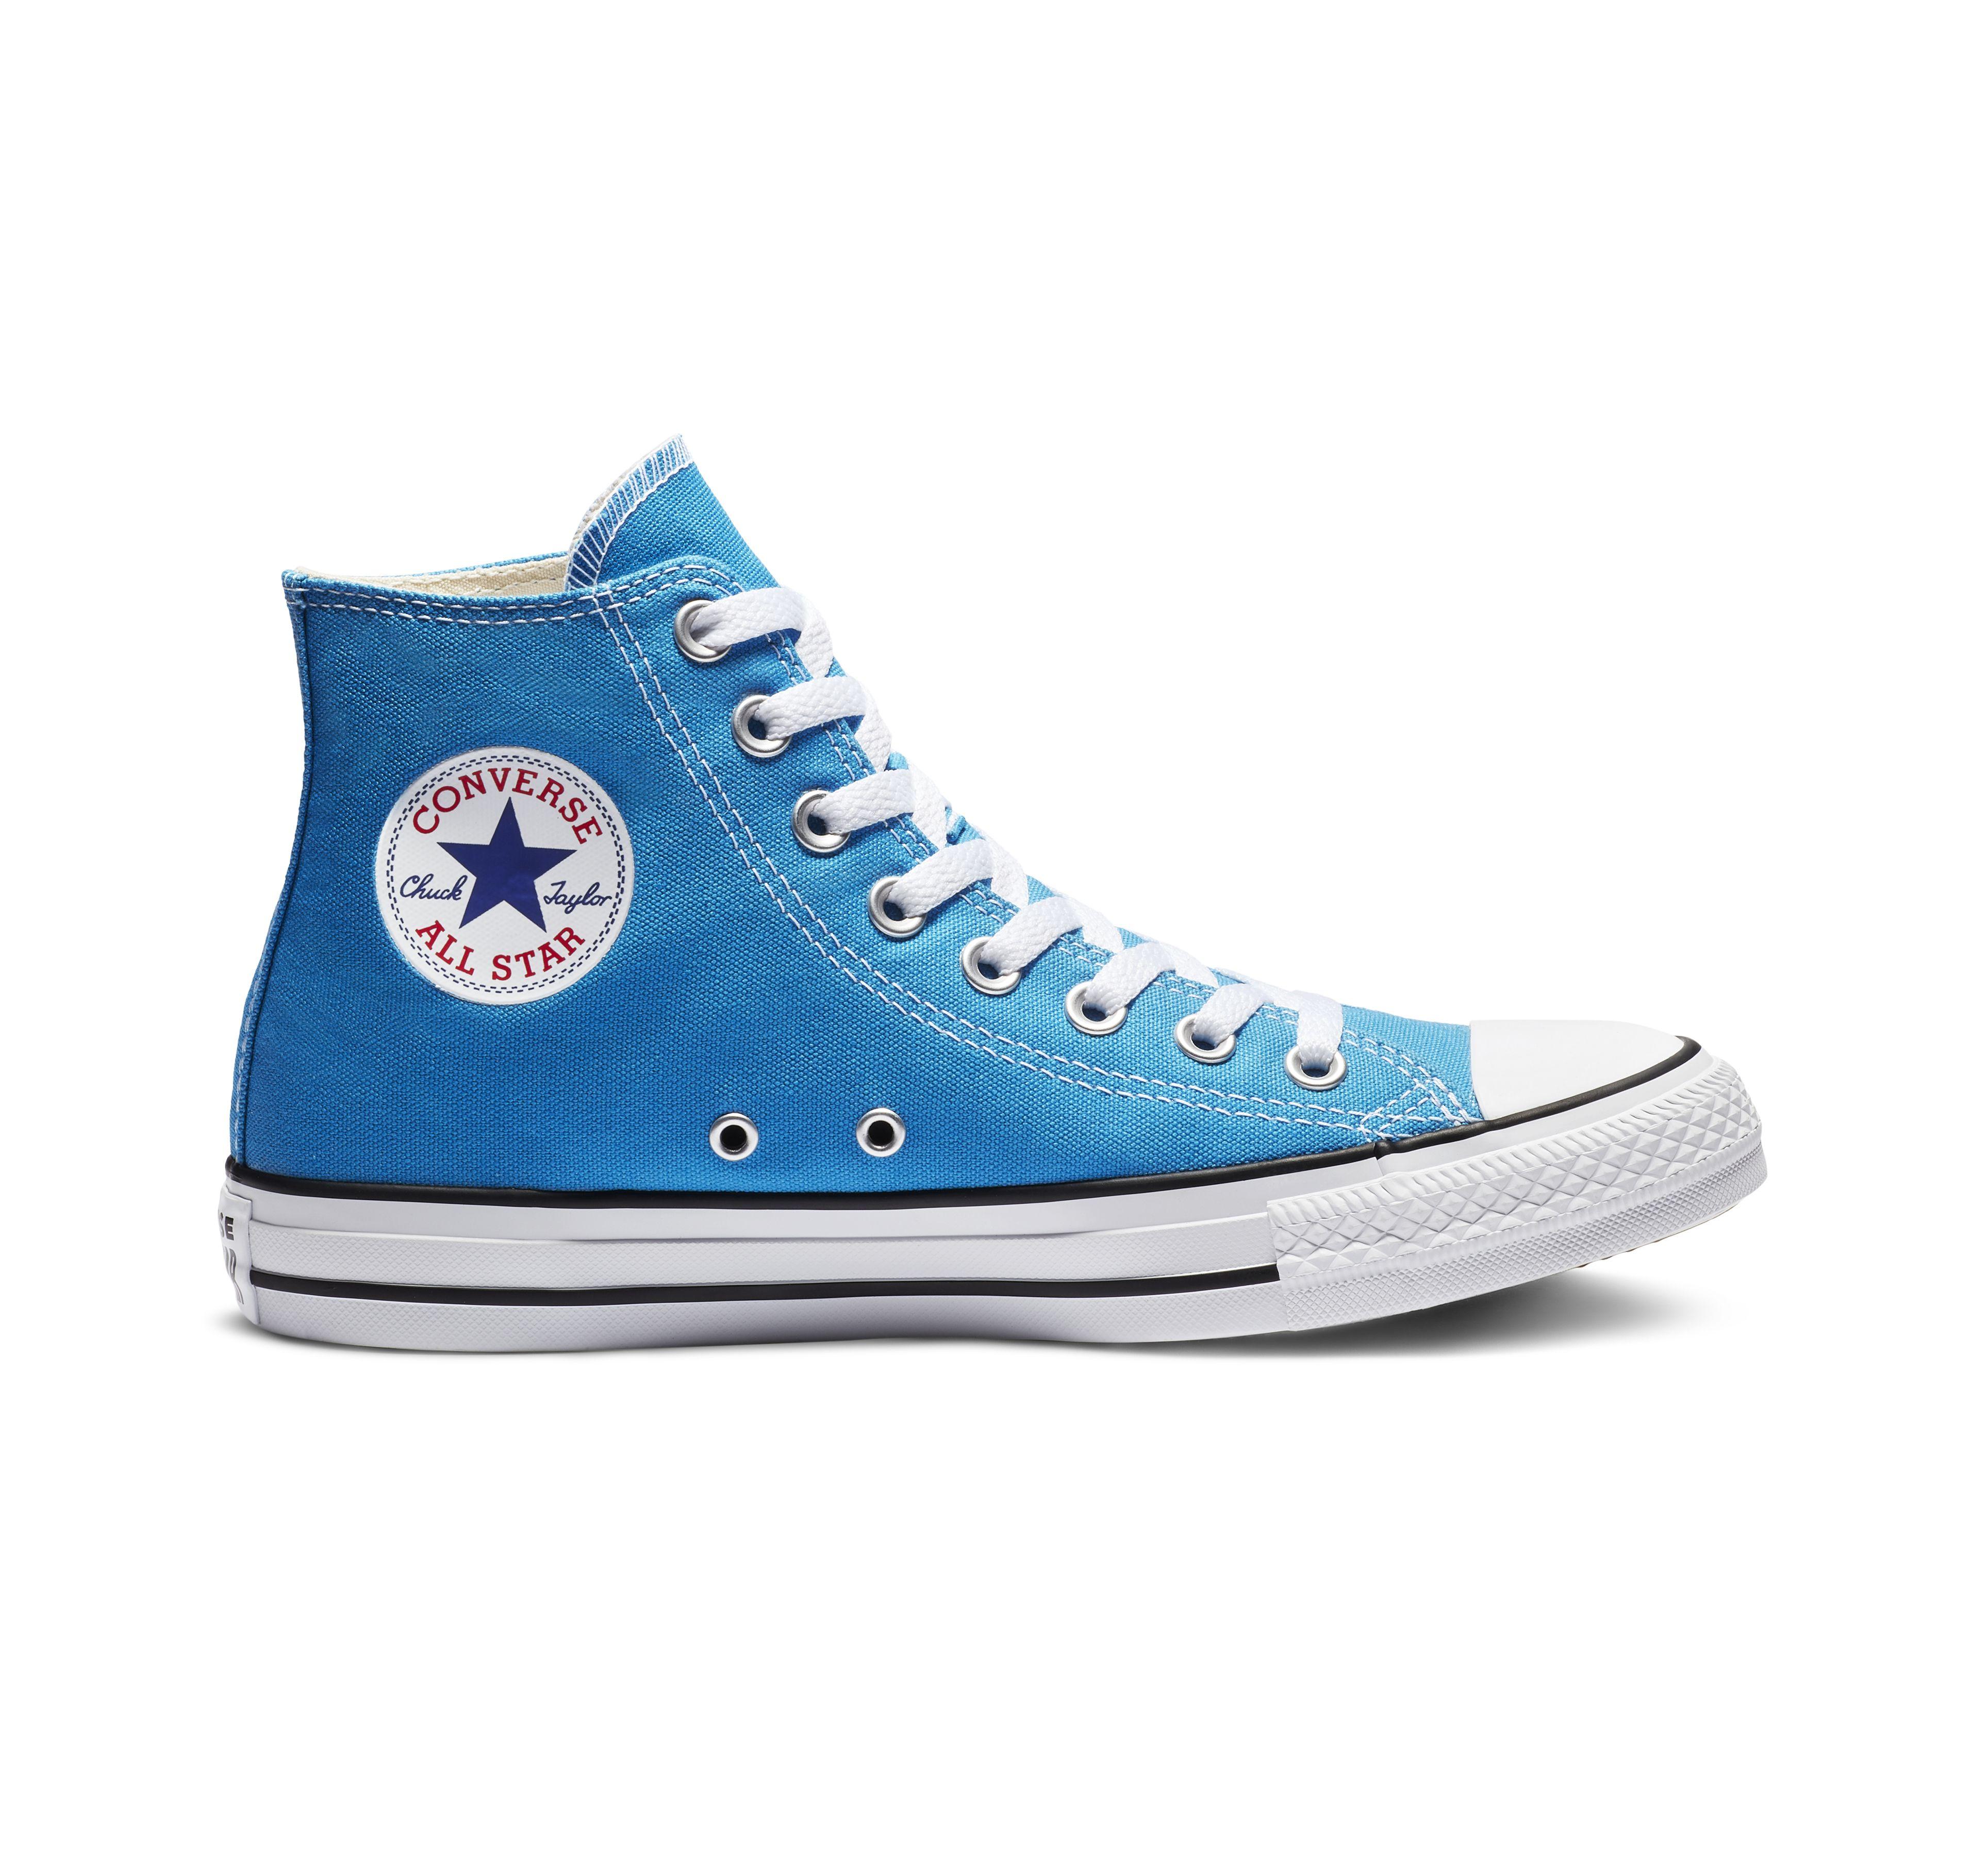 Product Image: Charlie Hi Top Converse | Pink converse